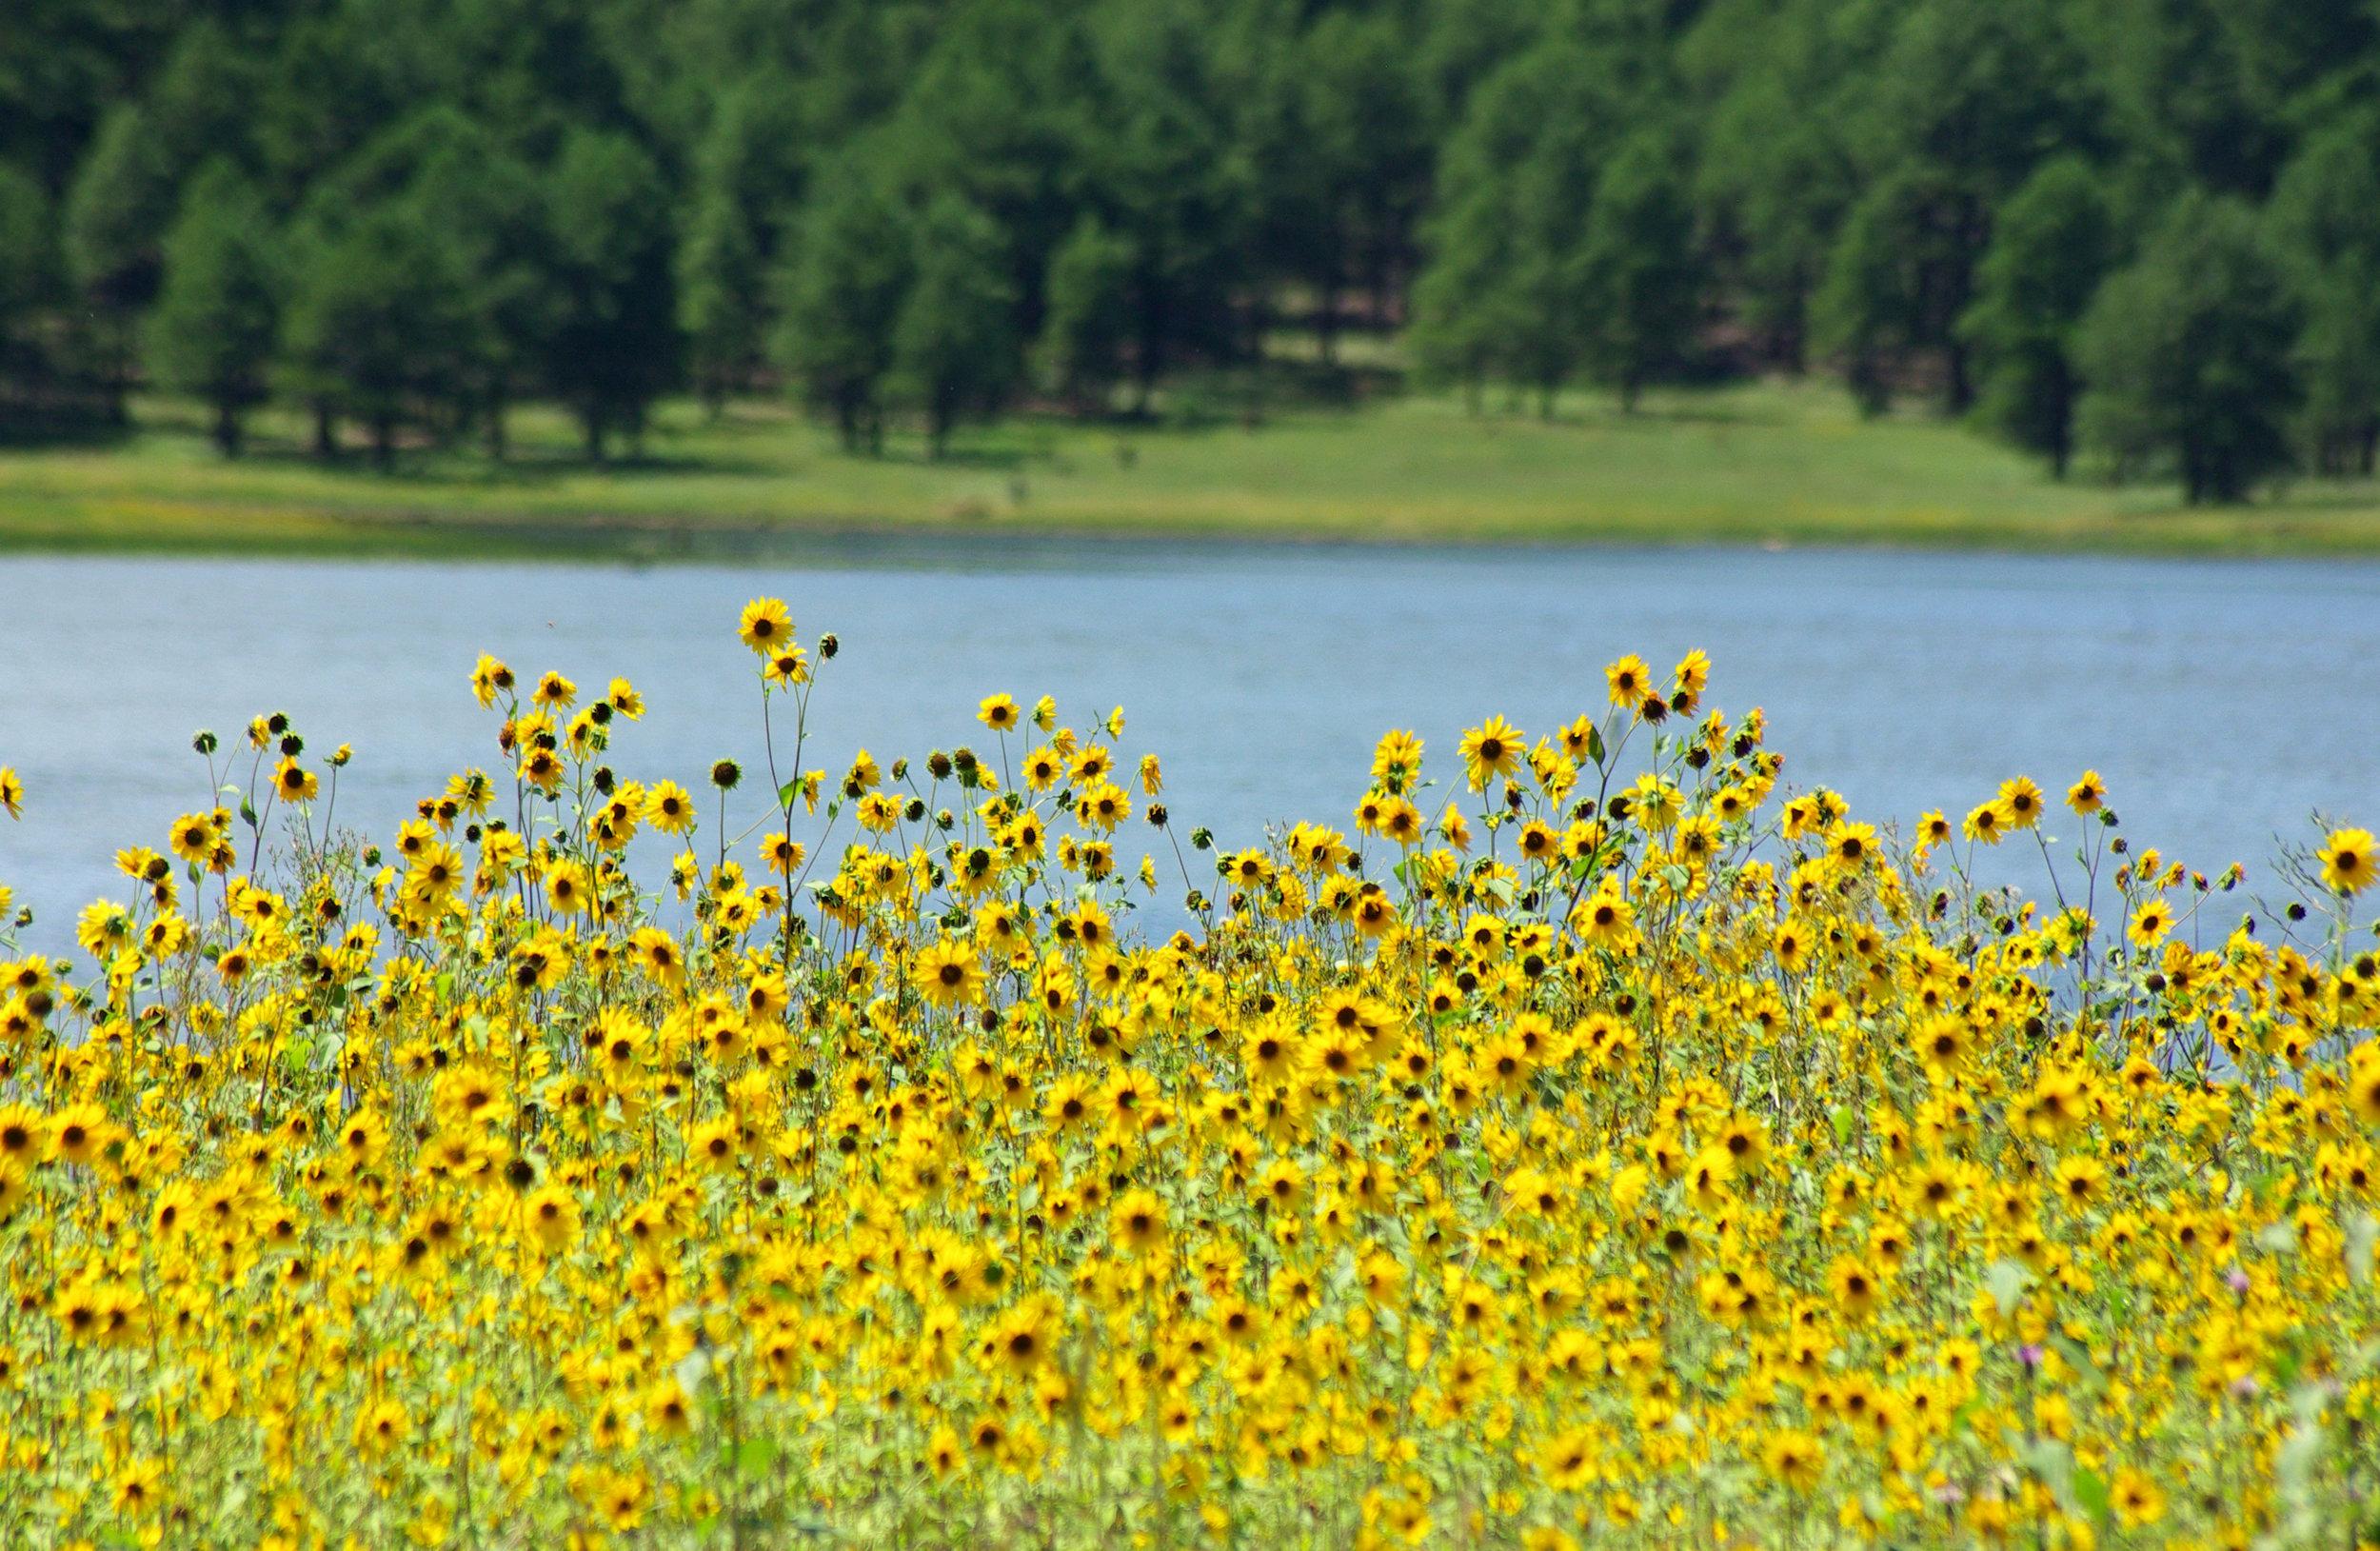 Sunflowers along the hillside that flanks the shores of Lake Mary | Taken 8 22 10 by Gary Garner